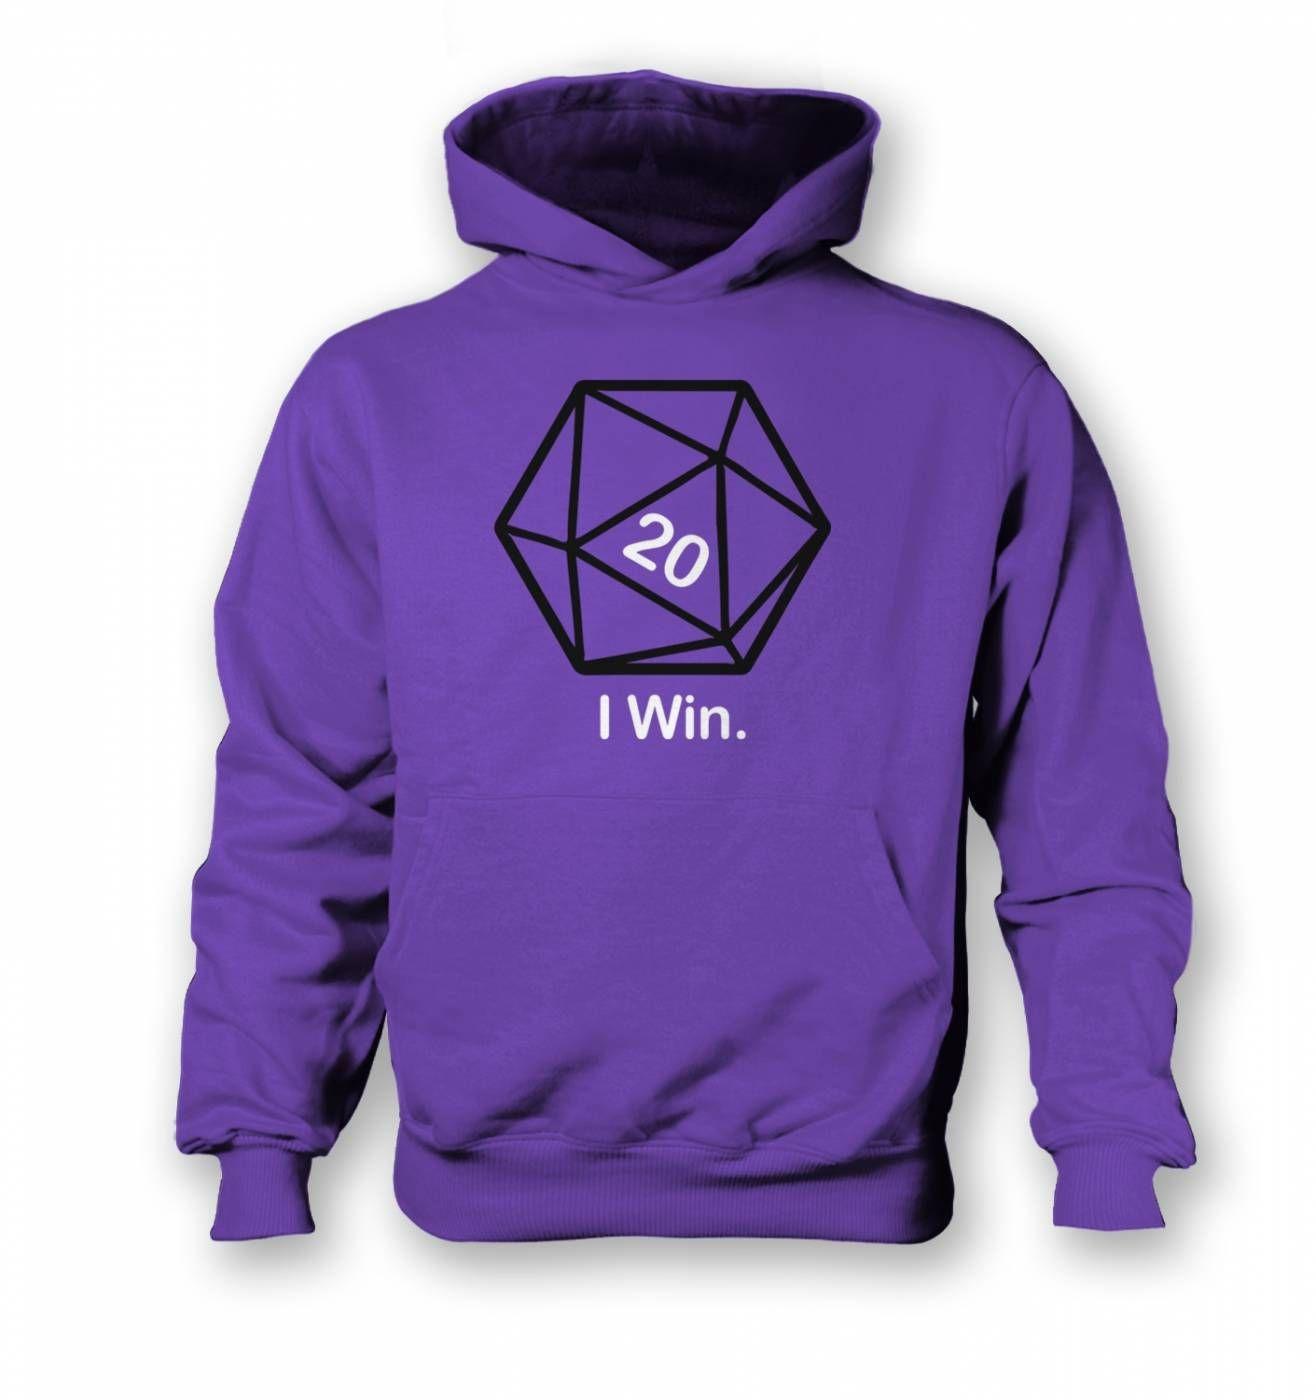 D20 I Win kids' hoodie